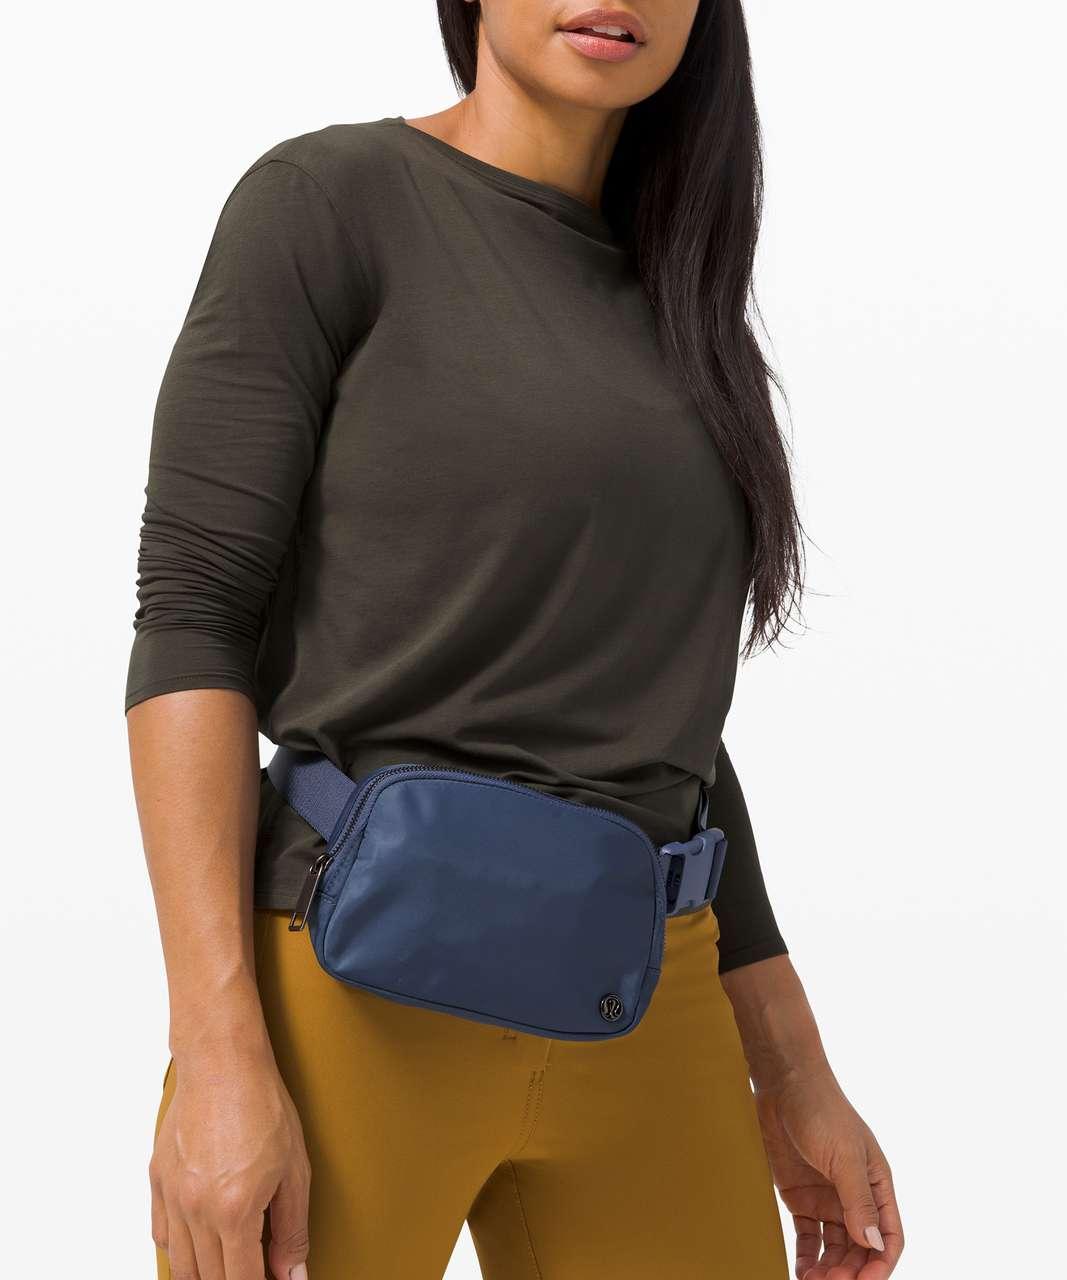 Lululemon Everywhere Belt Bag *1L - Iron Blue